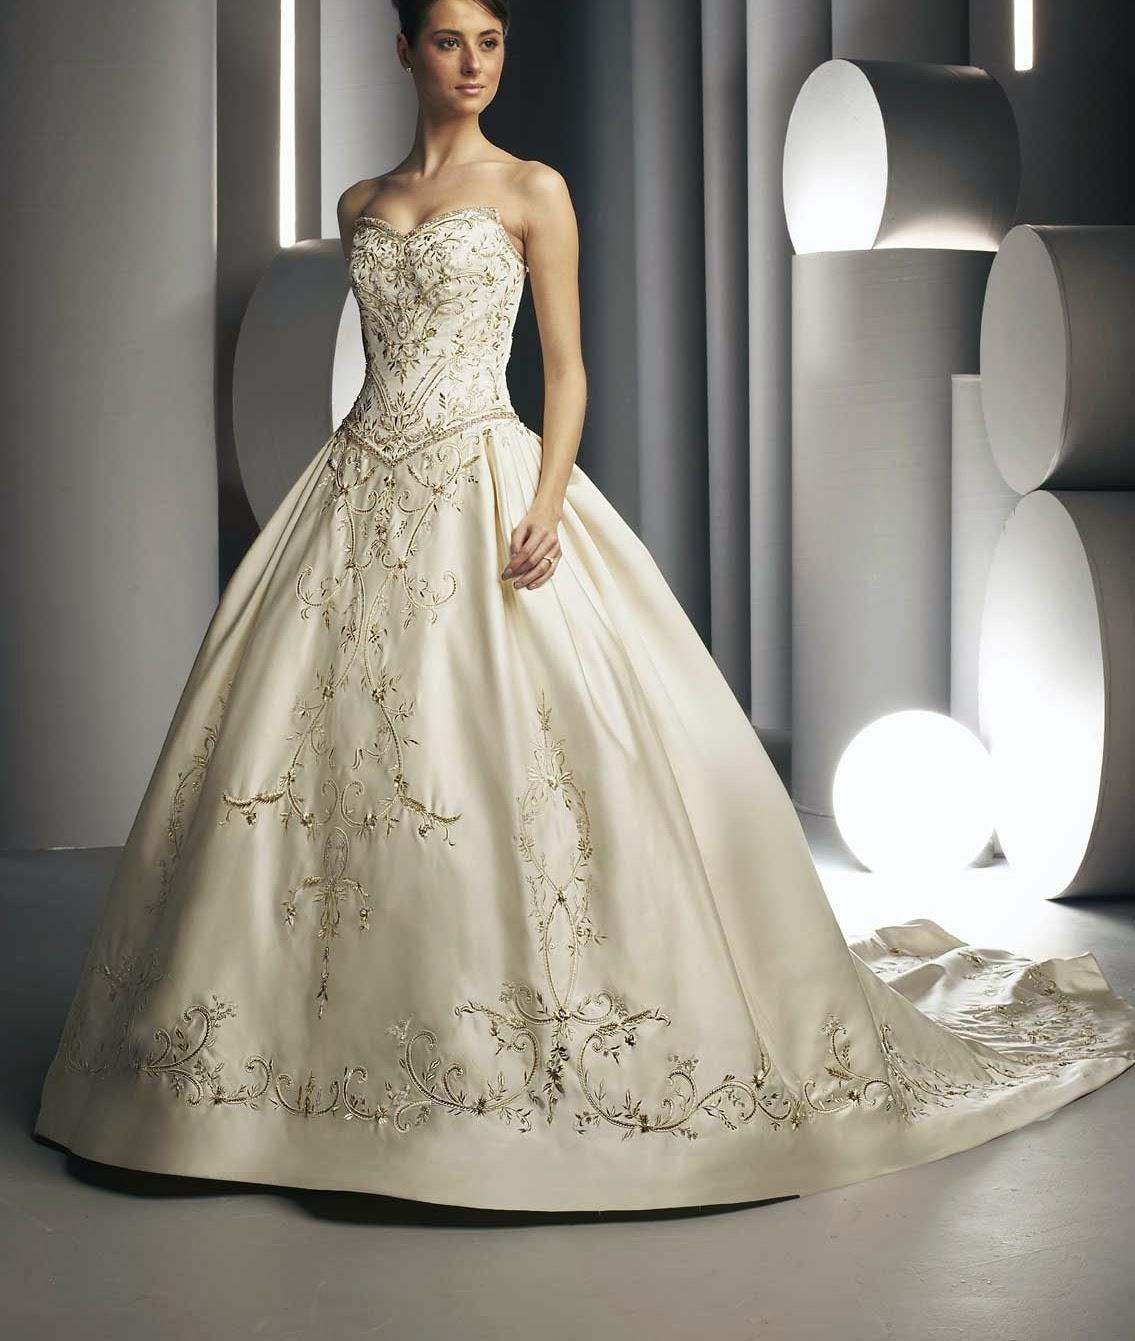 long champane colored sleeveless wedding dresses champaign wedding dress Long Champane Colored Sleeveless Wedding Dresses 17